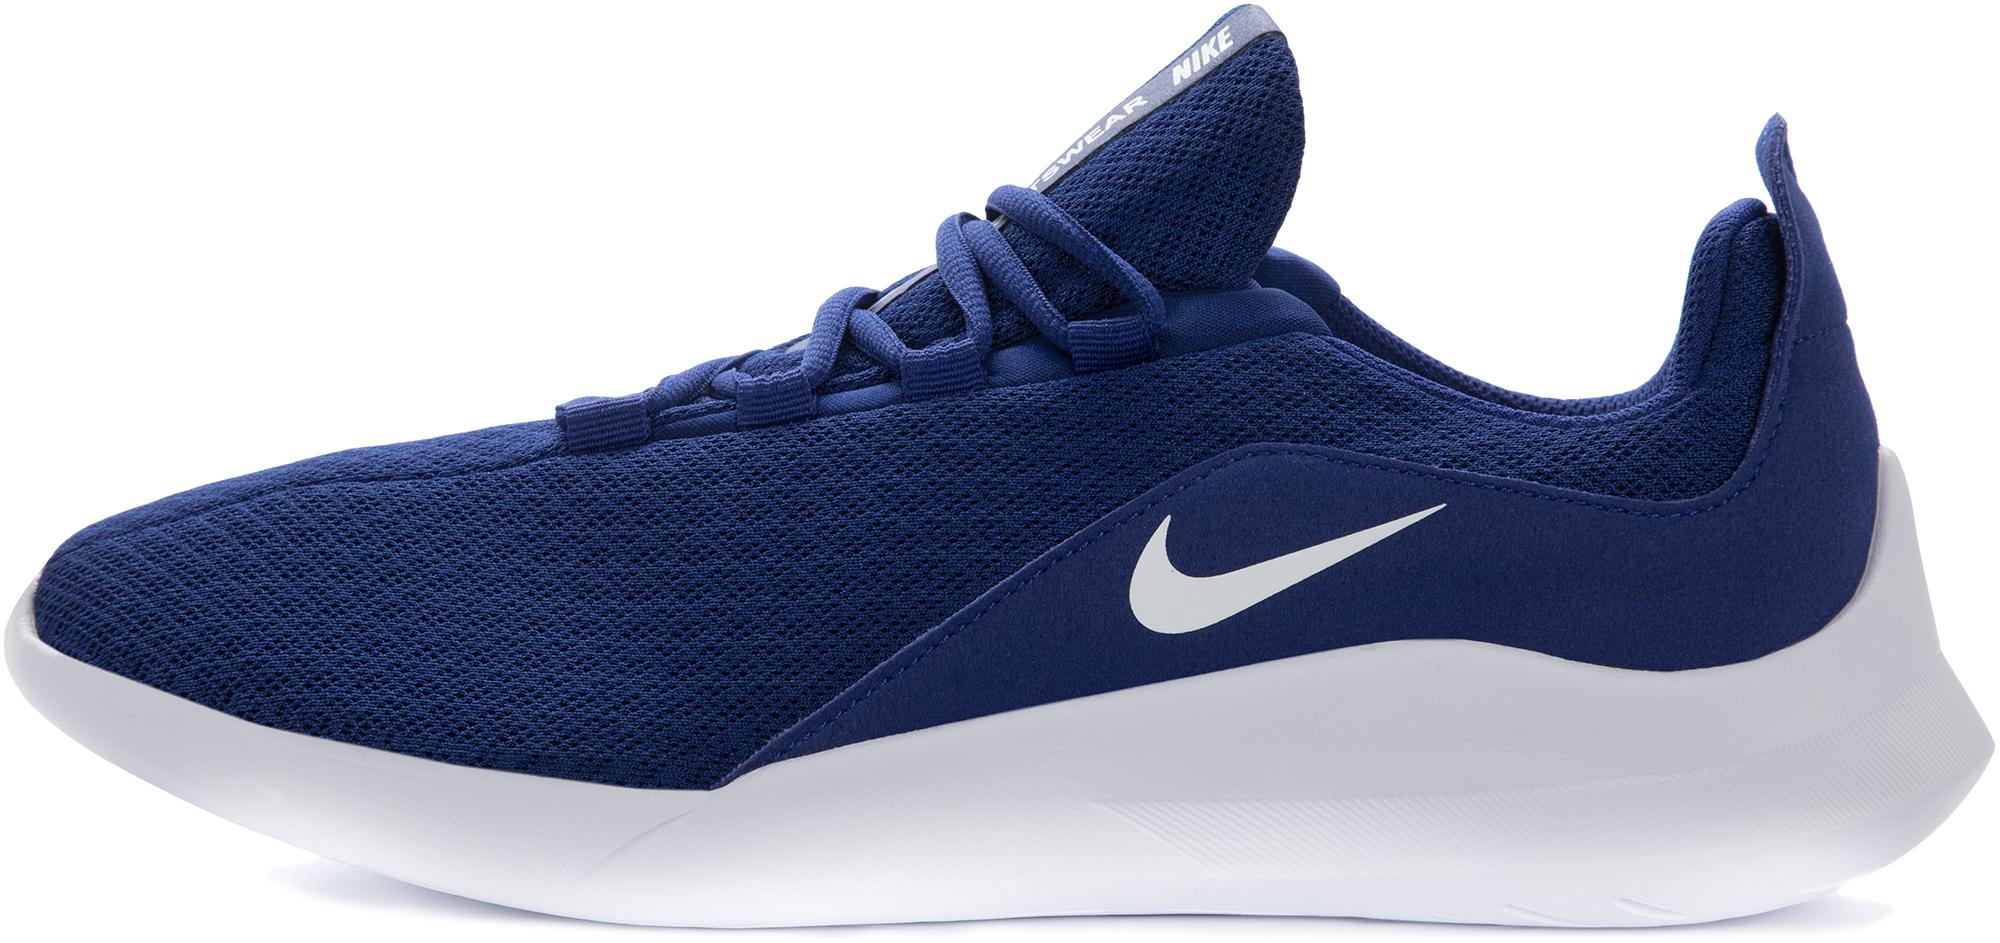 Фото Nike Кроссовки мужские Nike Viale, размер 44